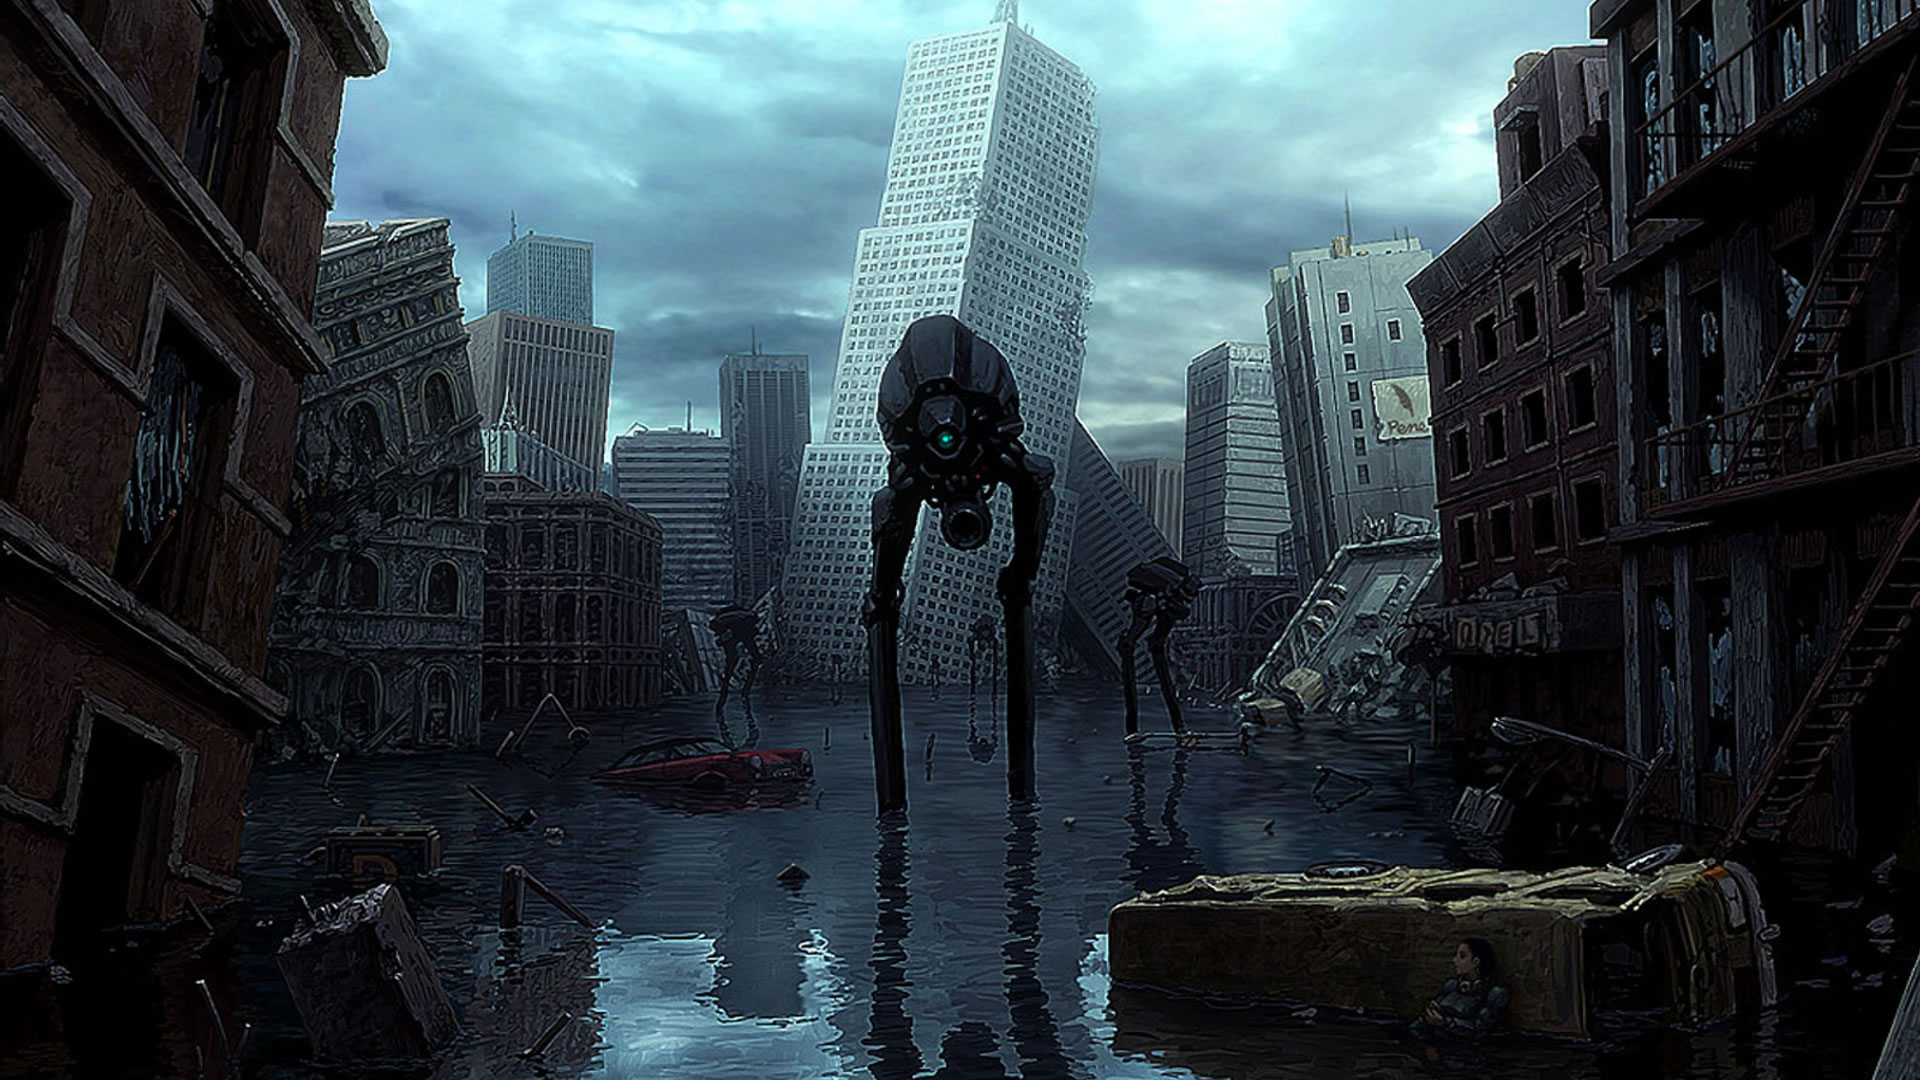 Sci Fi Desktop Backgrounds: Desktop Wallpaper Science Fiction Theme